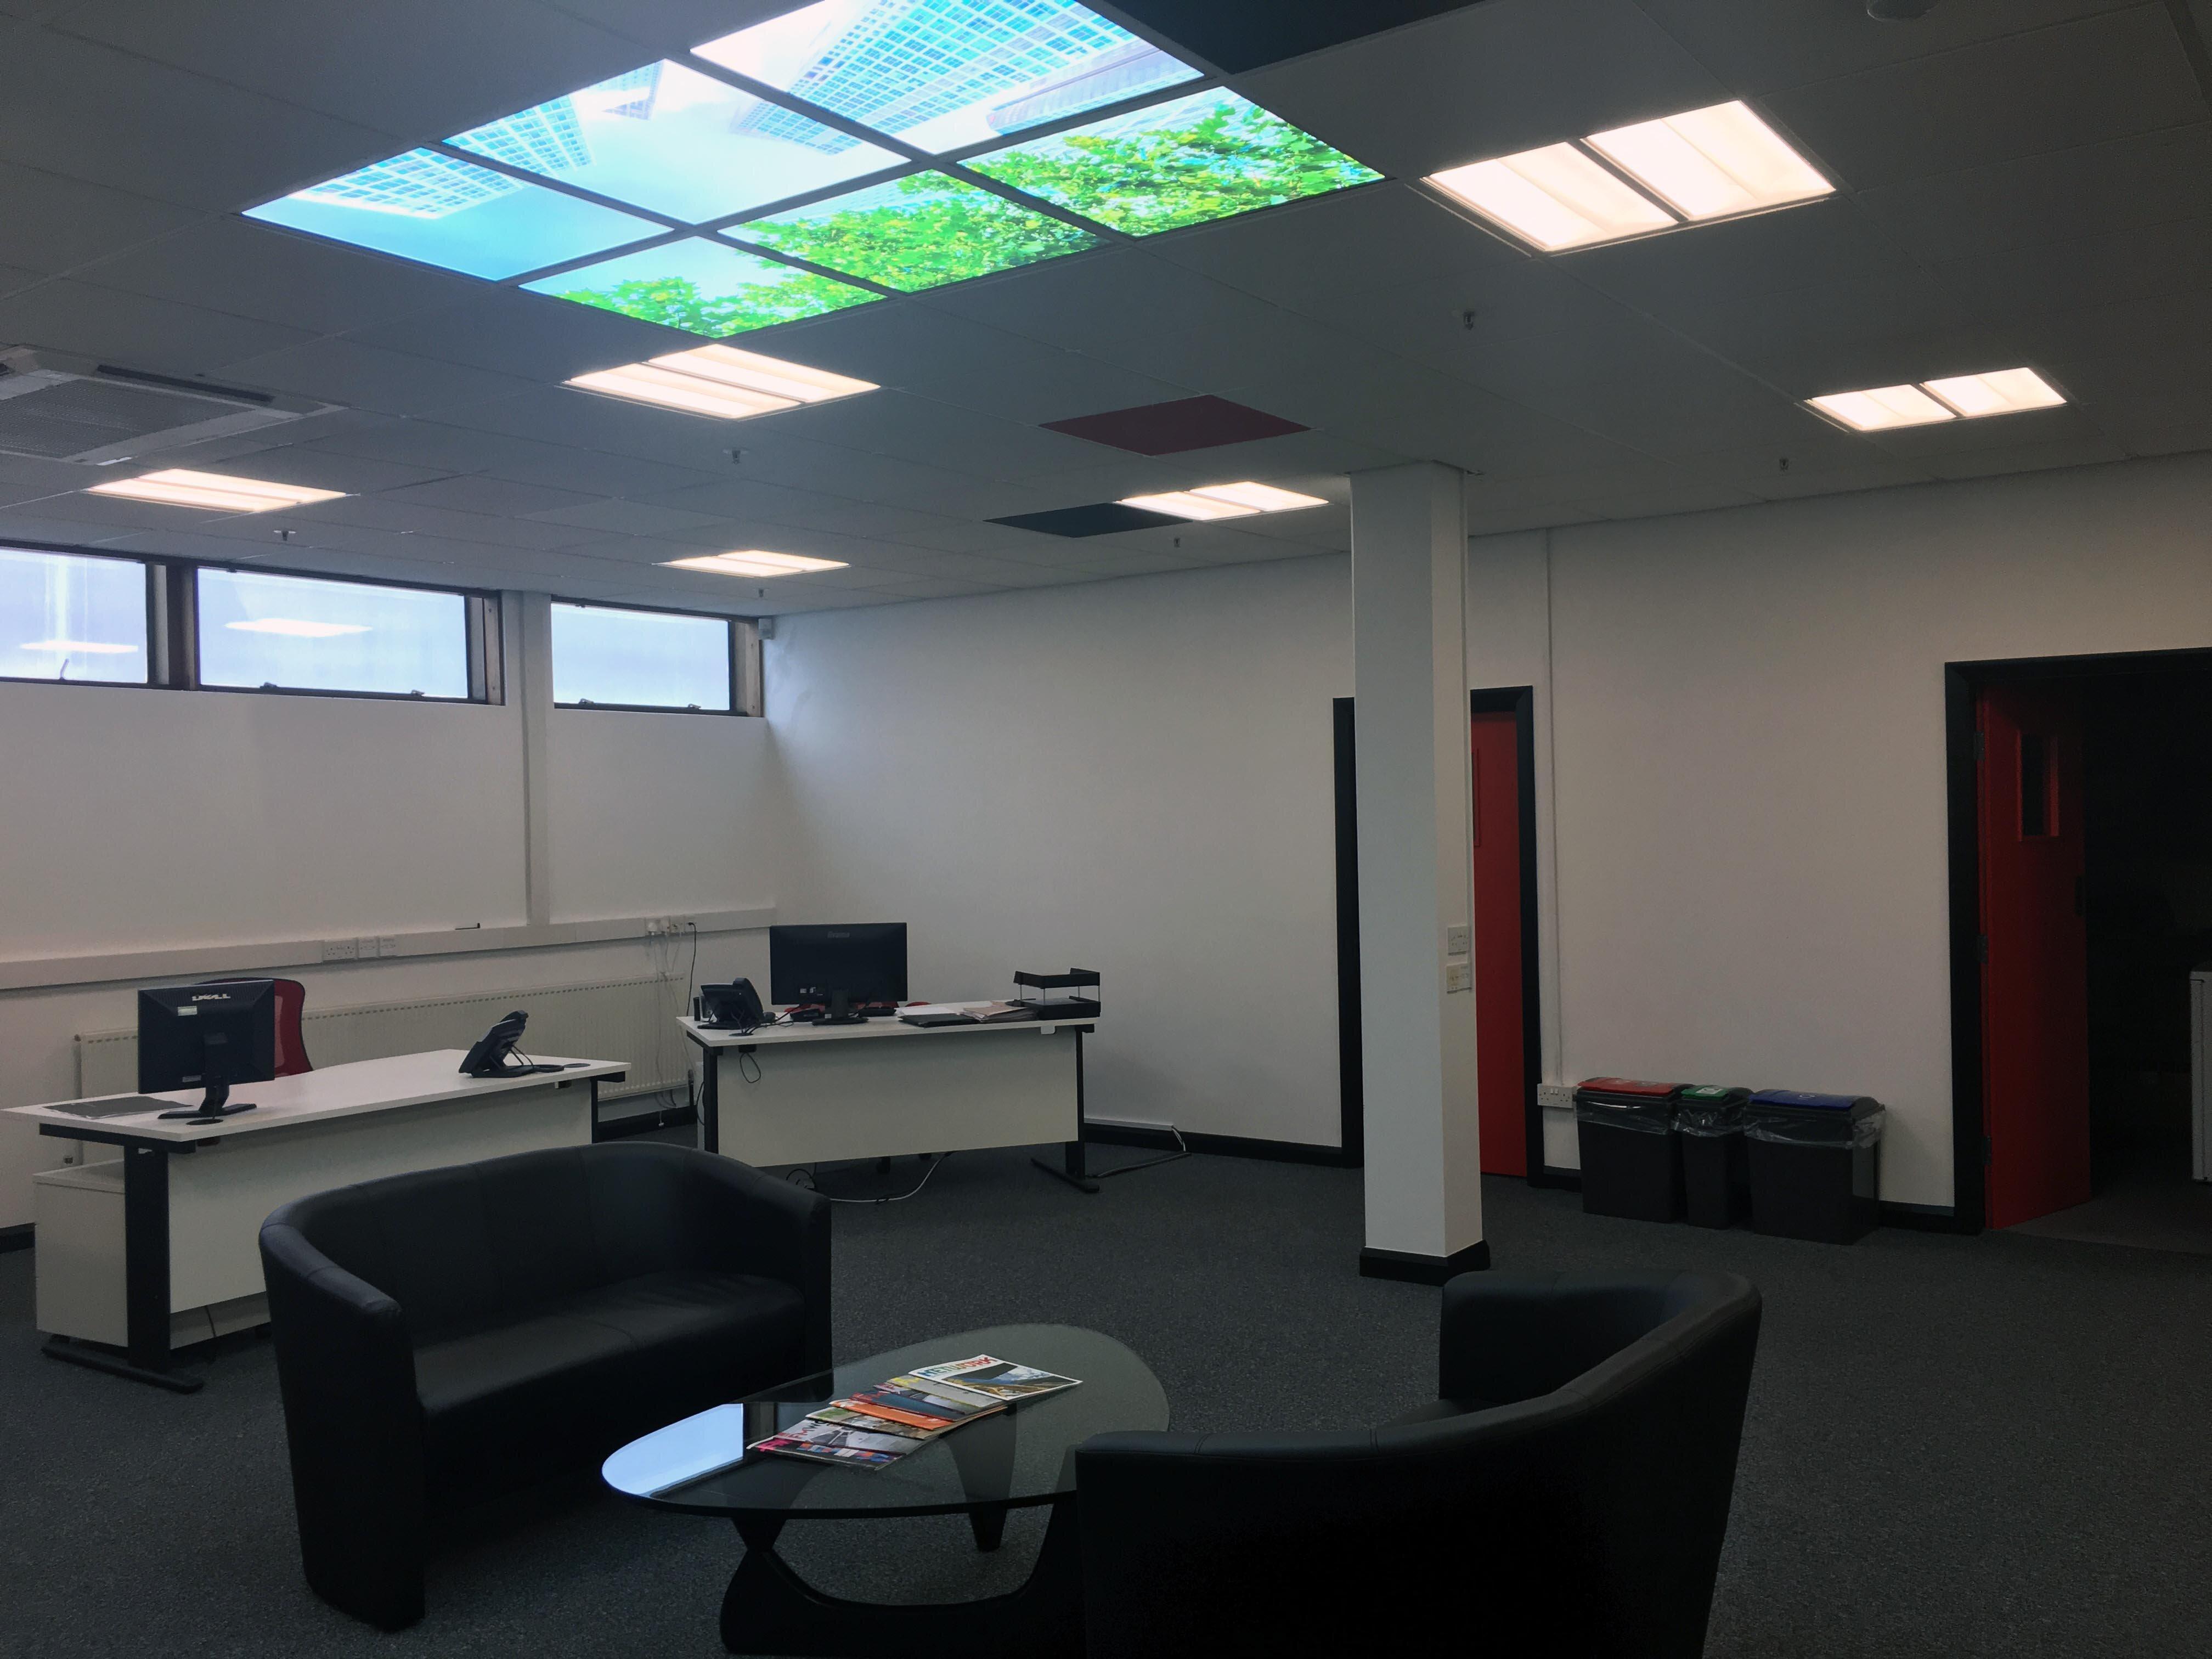 seating-area-lights